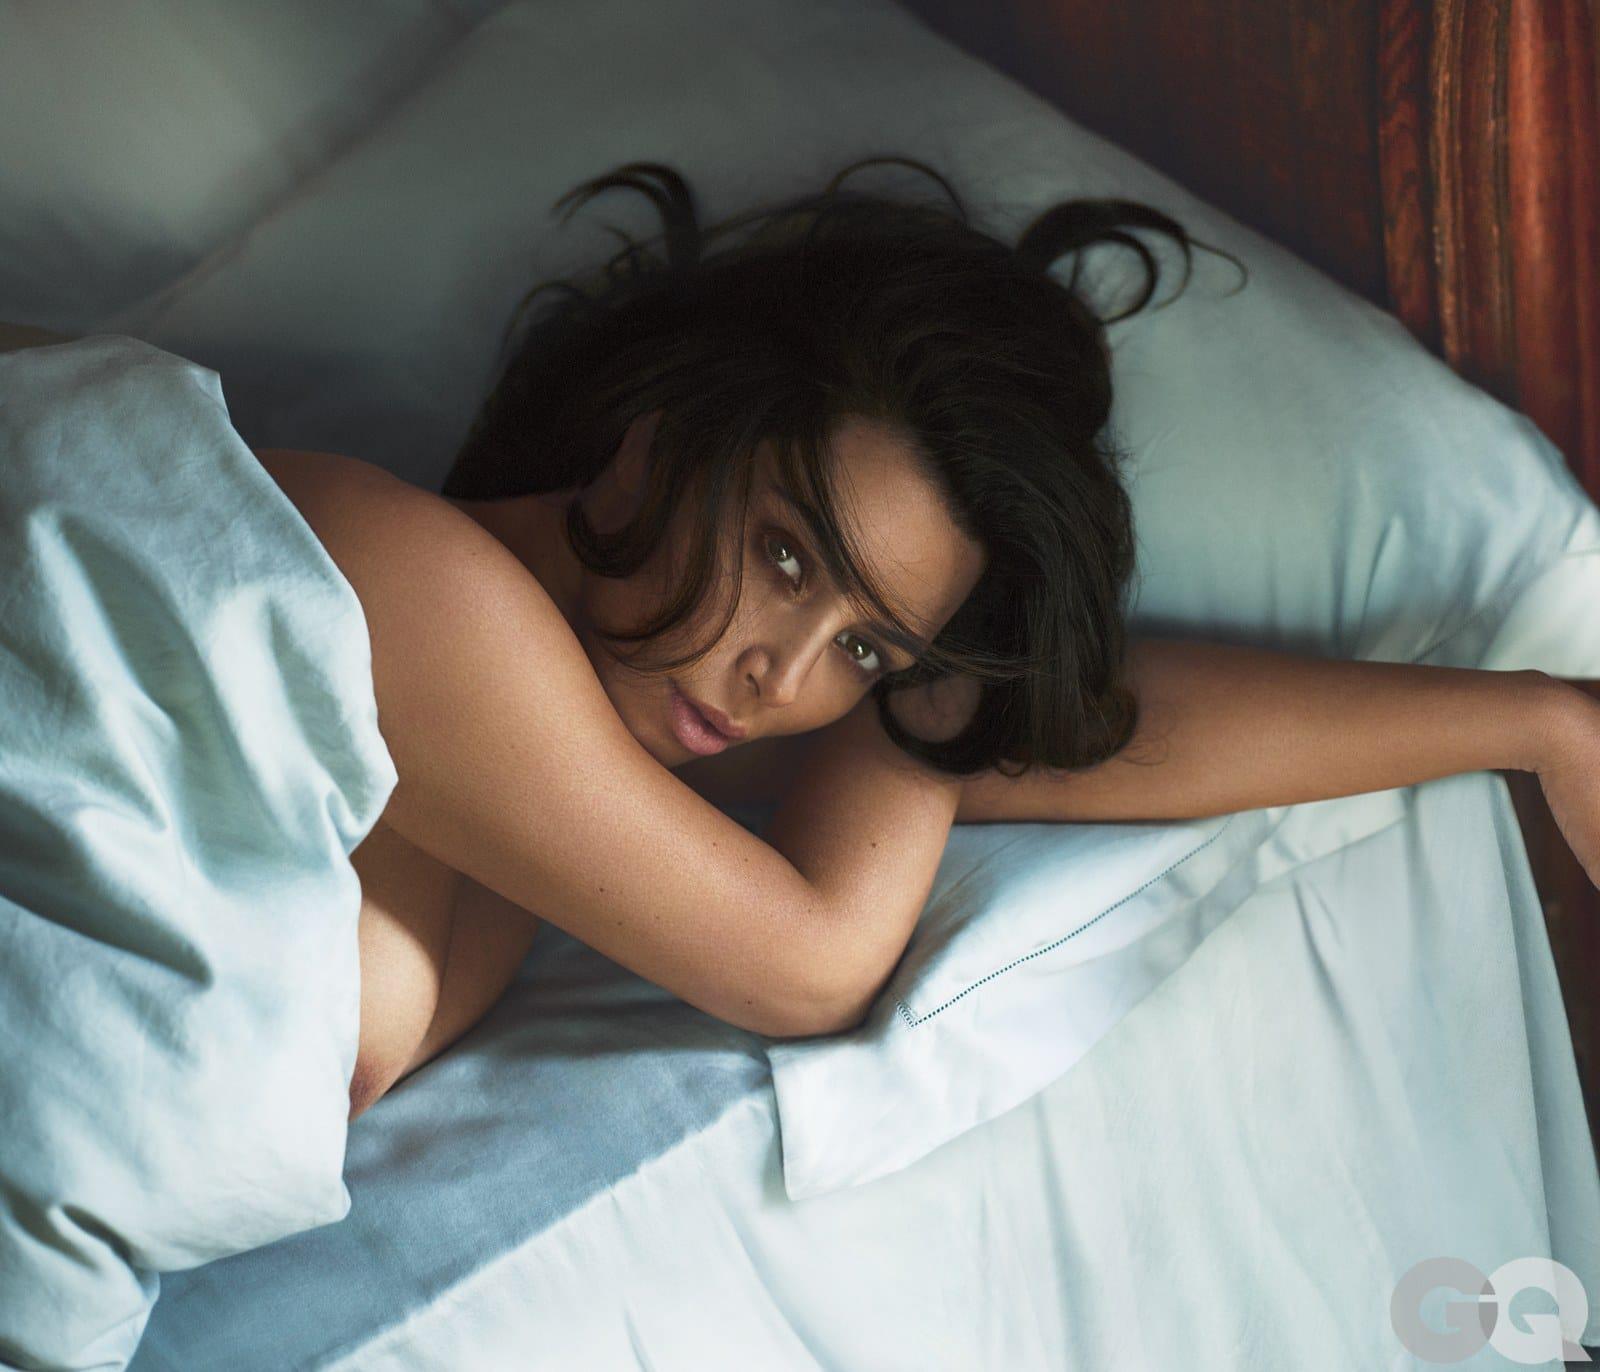 Kim Kardashian Sexy GQ Photoshoot 2